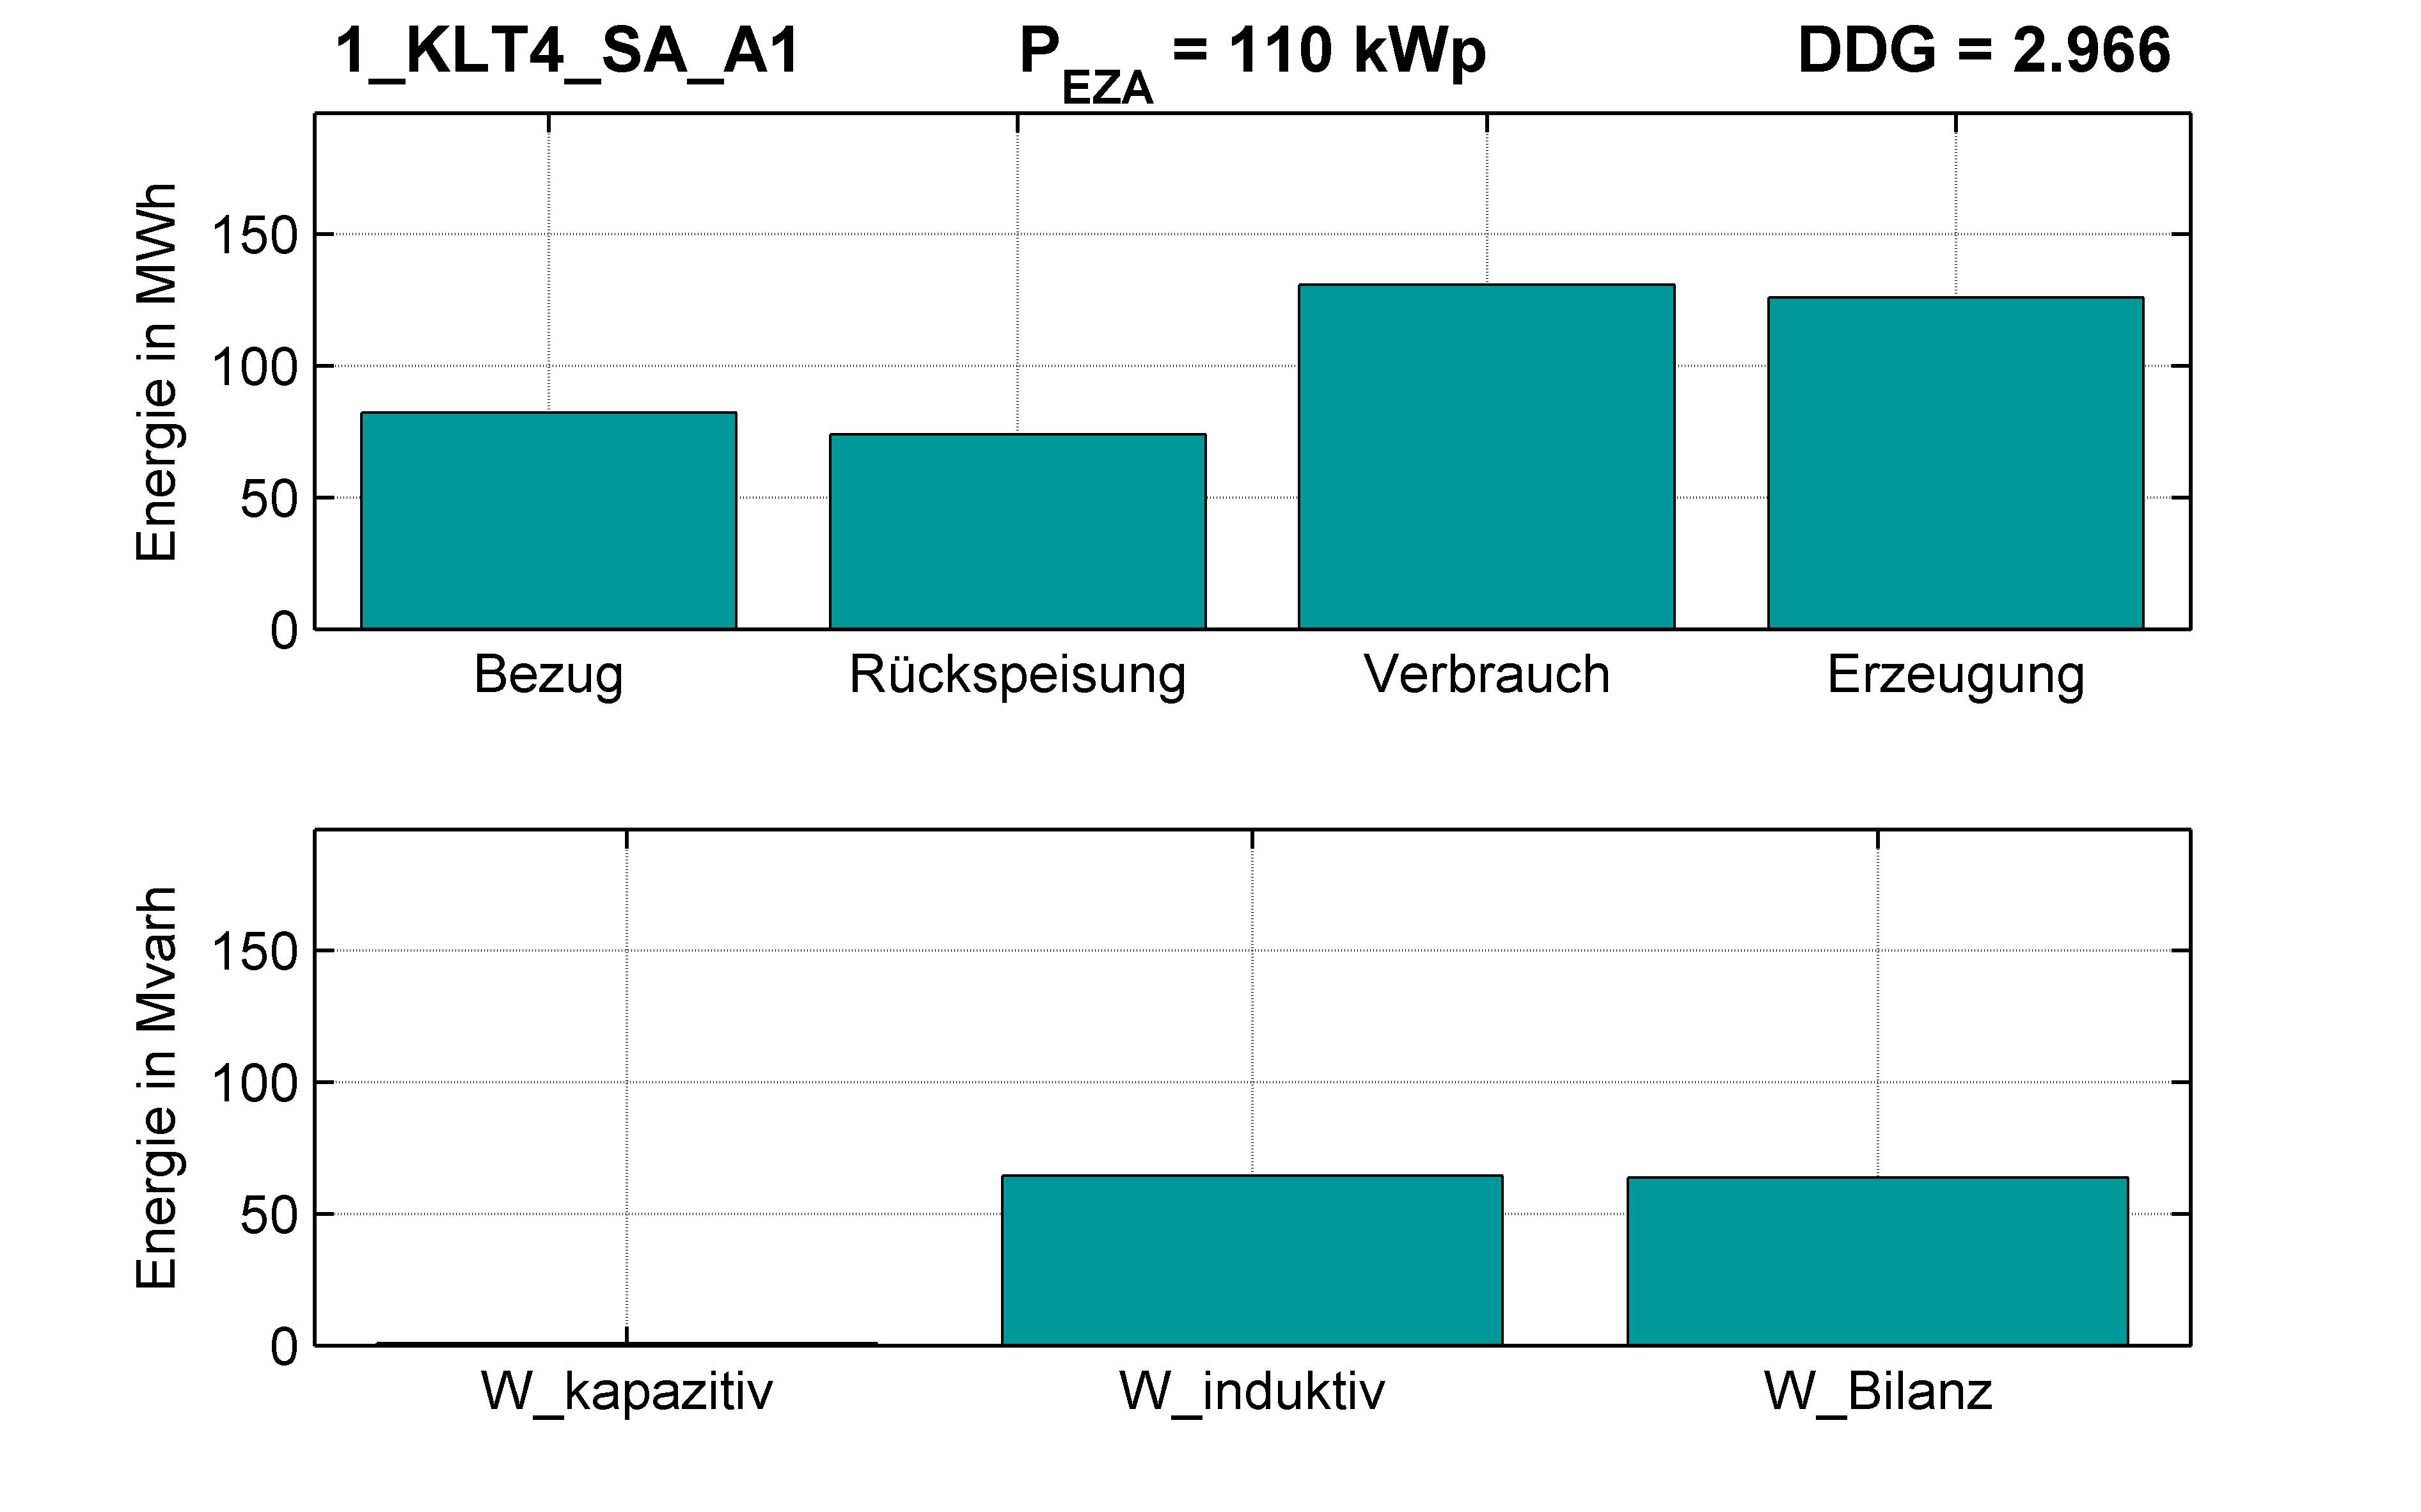 KLT4 | KABEL (SA) A1 | PQ-Bilanz